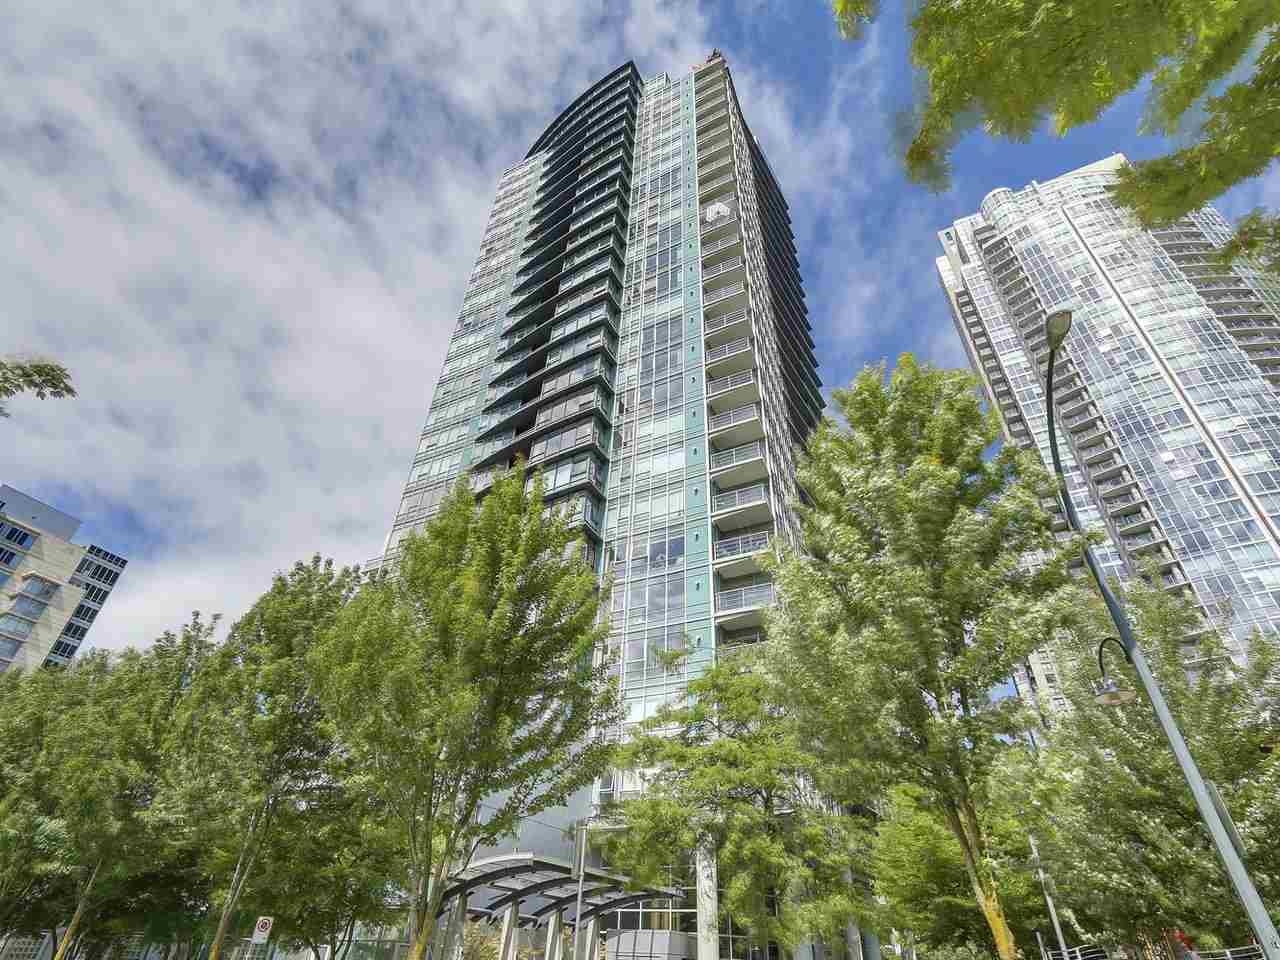 Condo Apartment at 1106 1483 HOMER STREET, Unit 1106, Vancouver West, British Columbia. Image 1